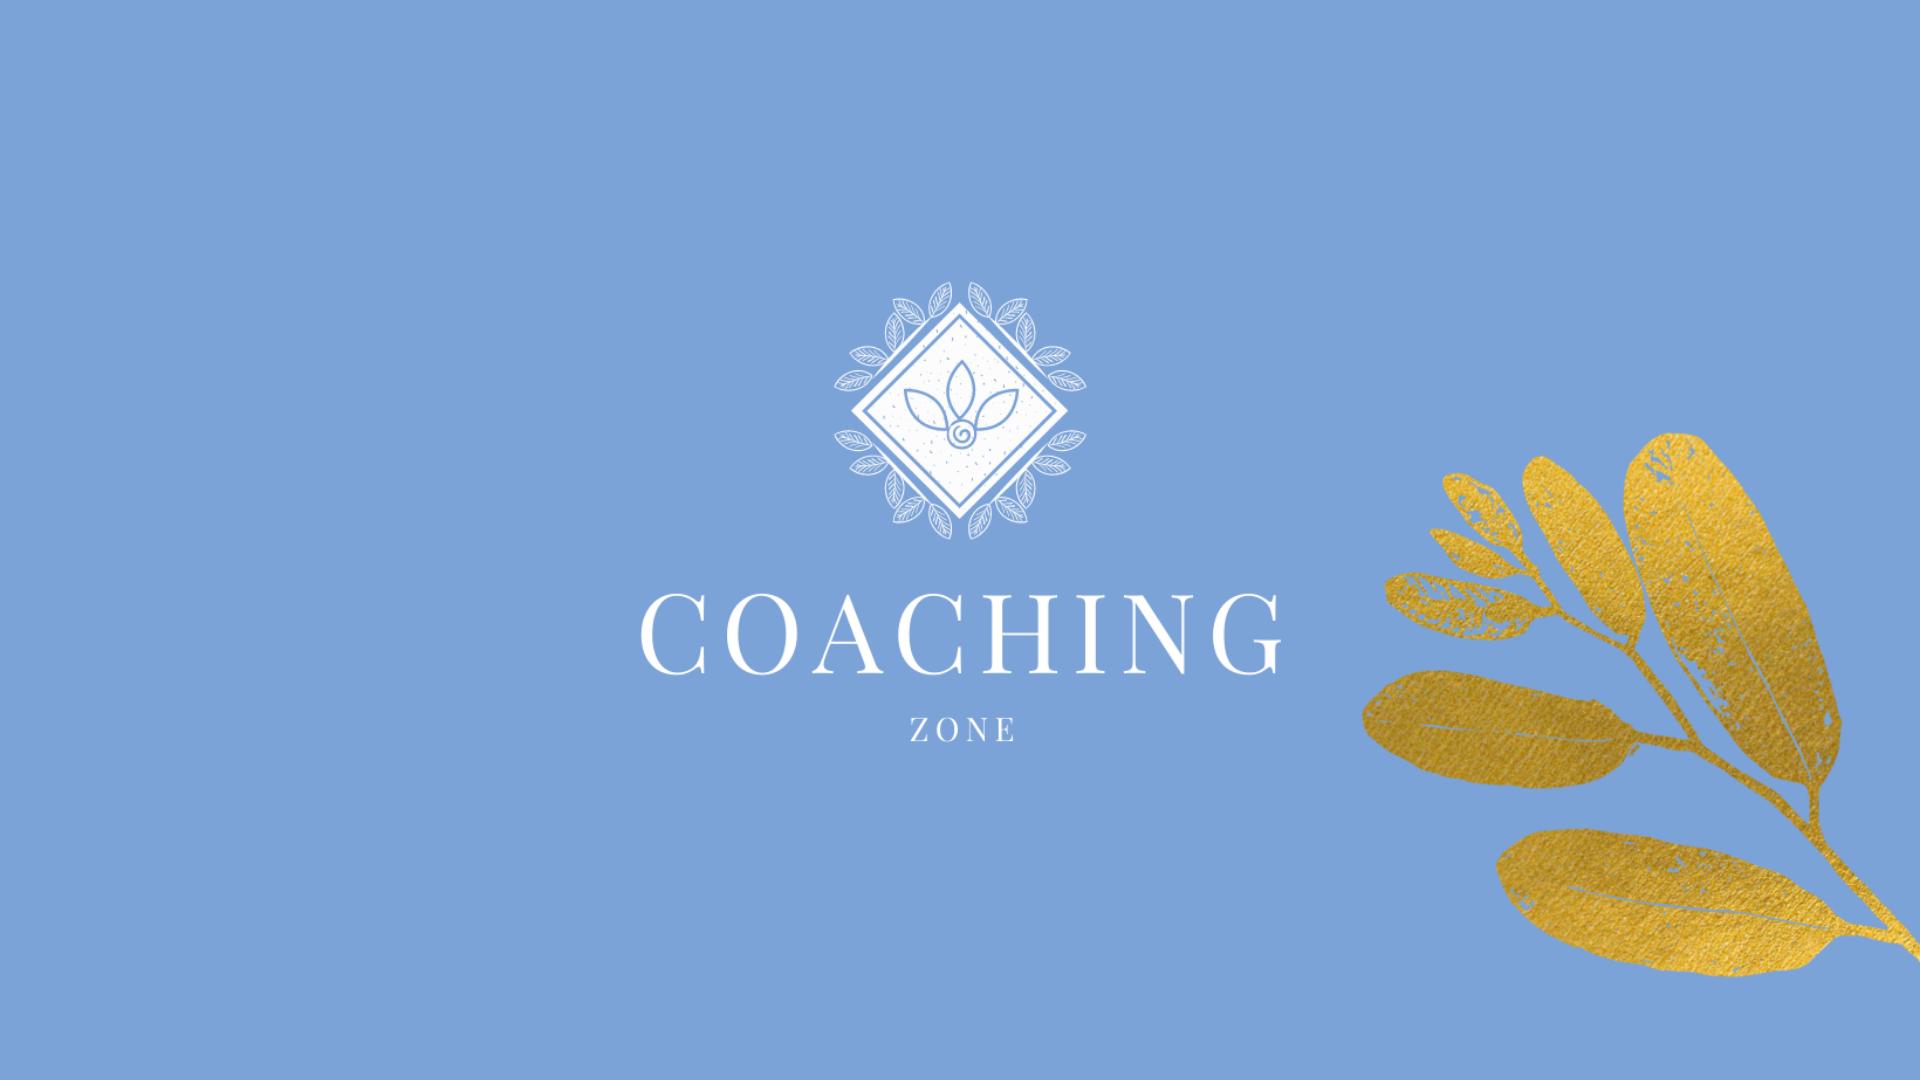 Coaching Zone - Energy Club